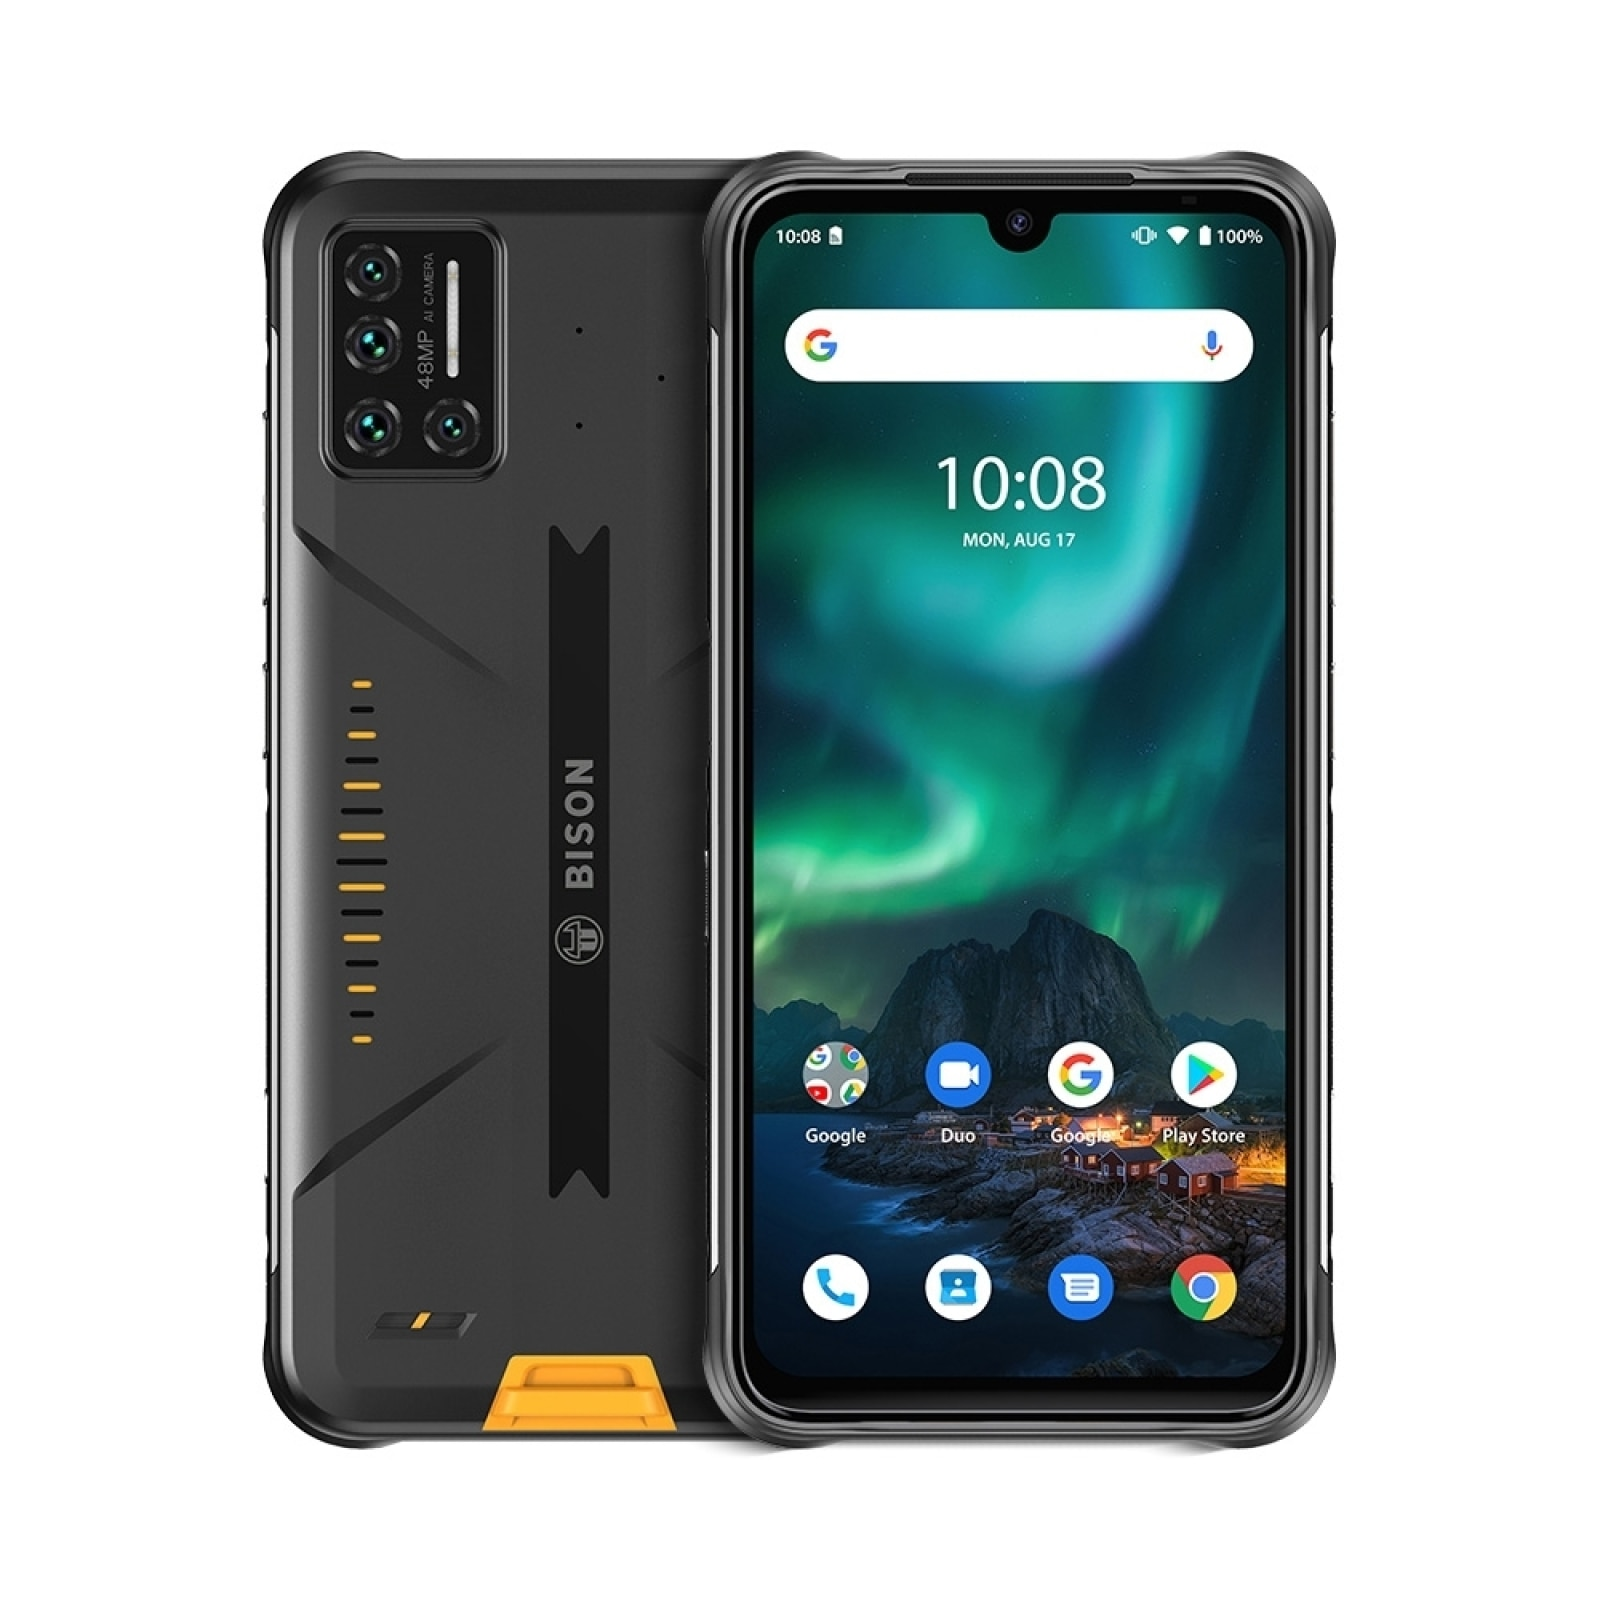 Смартфон UMIDIGI BISON 8 ГБ + 128 ГБ, водонепроницаемый, IP68/IP69K, 48 МП матрица, четыре камеры, экран 6,3 дюйма FHD +, NFC, Android 11